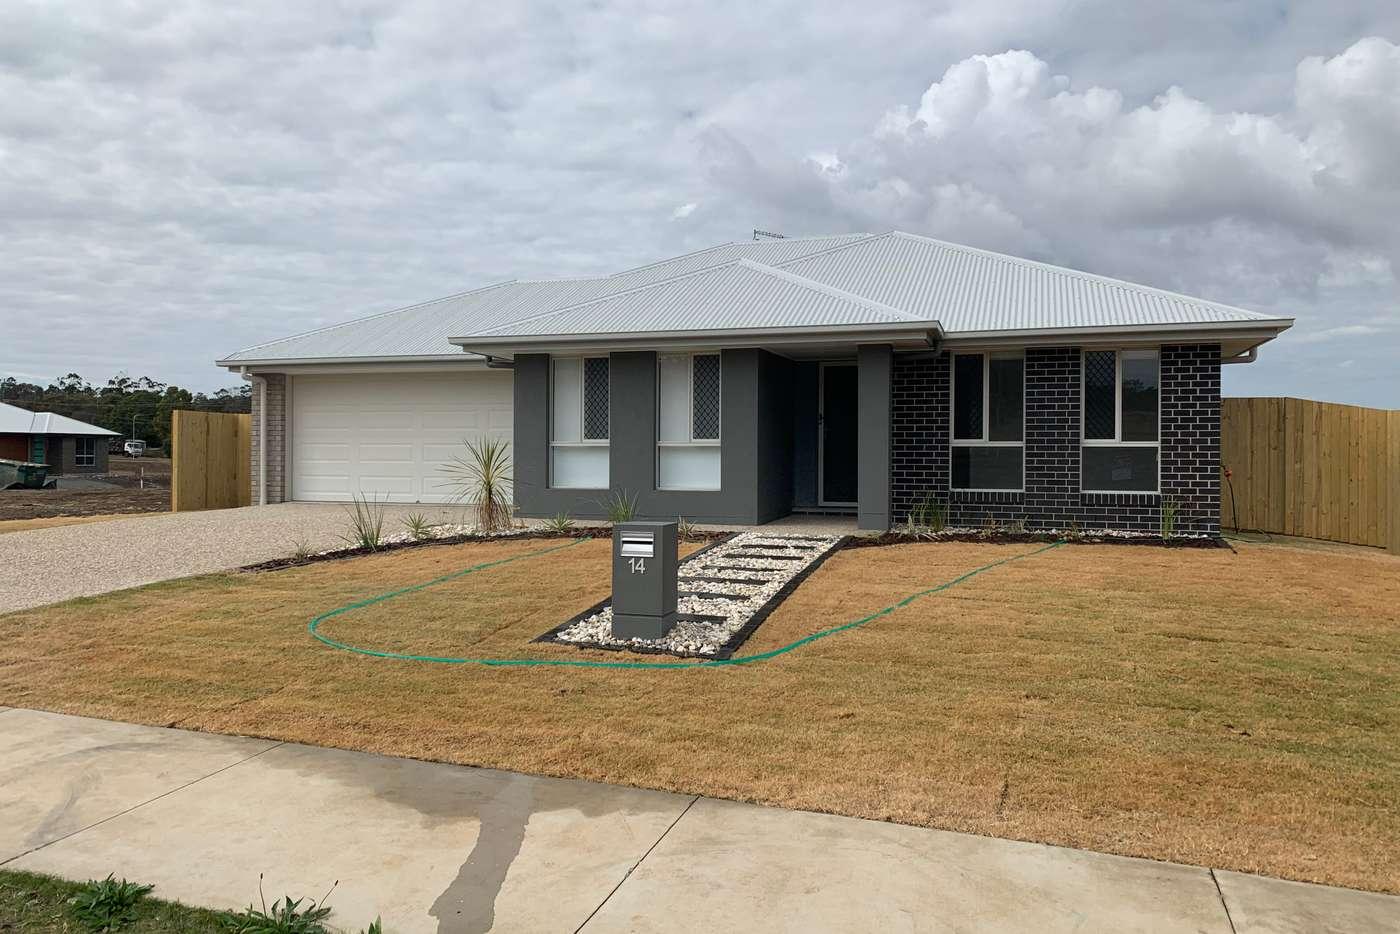 Main view of Homely house listing, 14 kaytons Street, Drayton QLD 4350